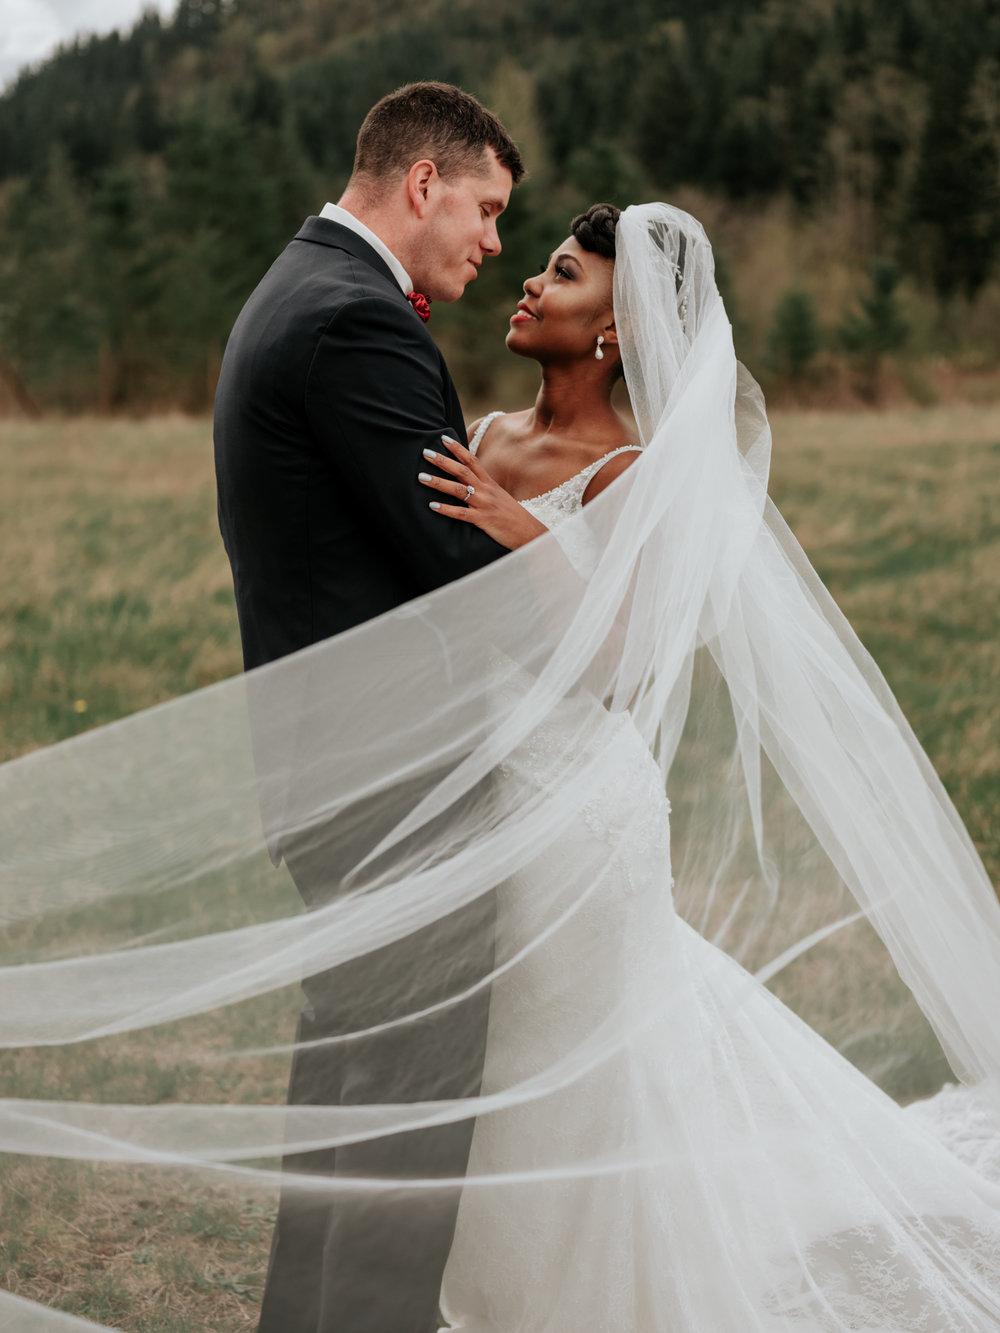 Stolen Glimpses Seattle Wedding Photographer at Rein Fire Ranch 31.jpg